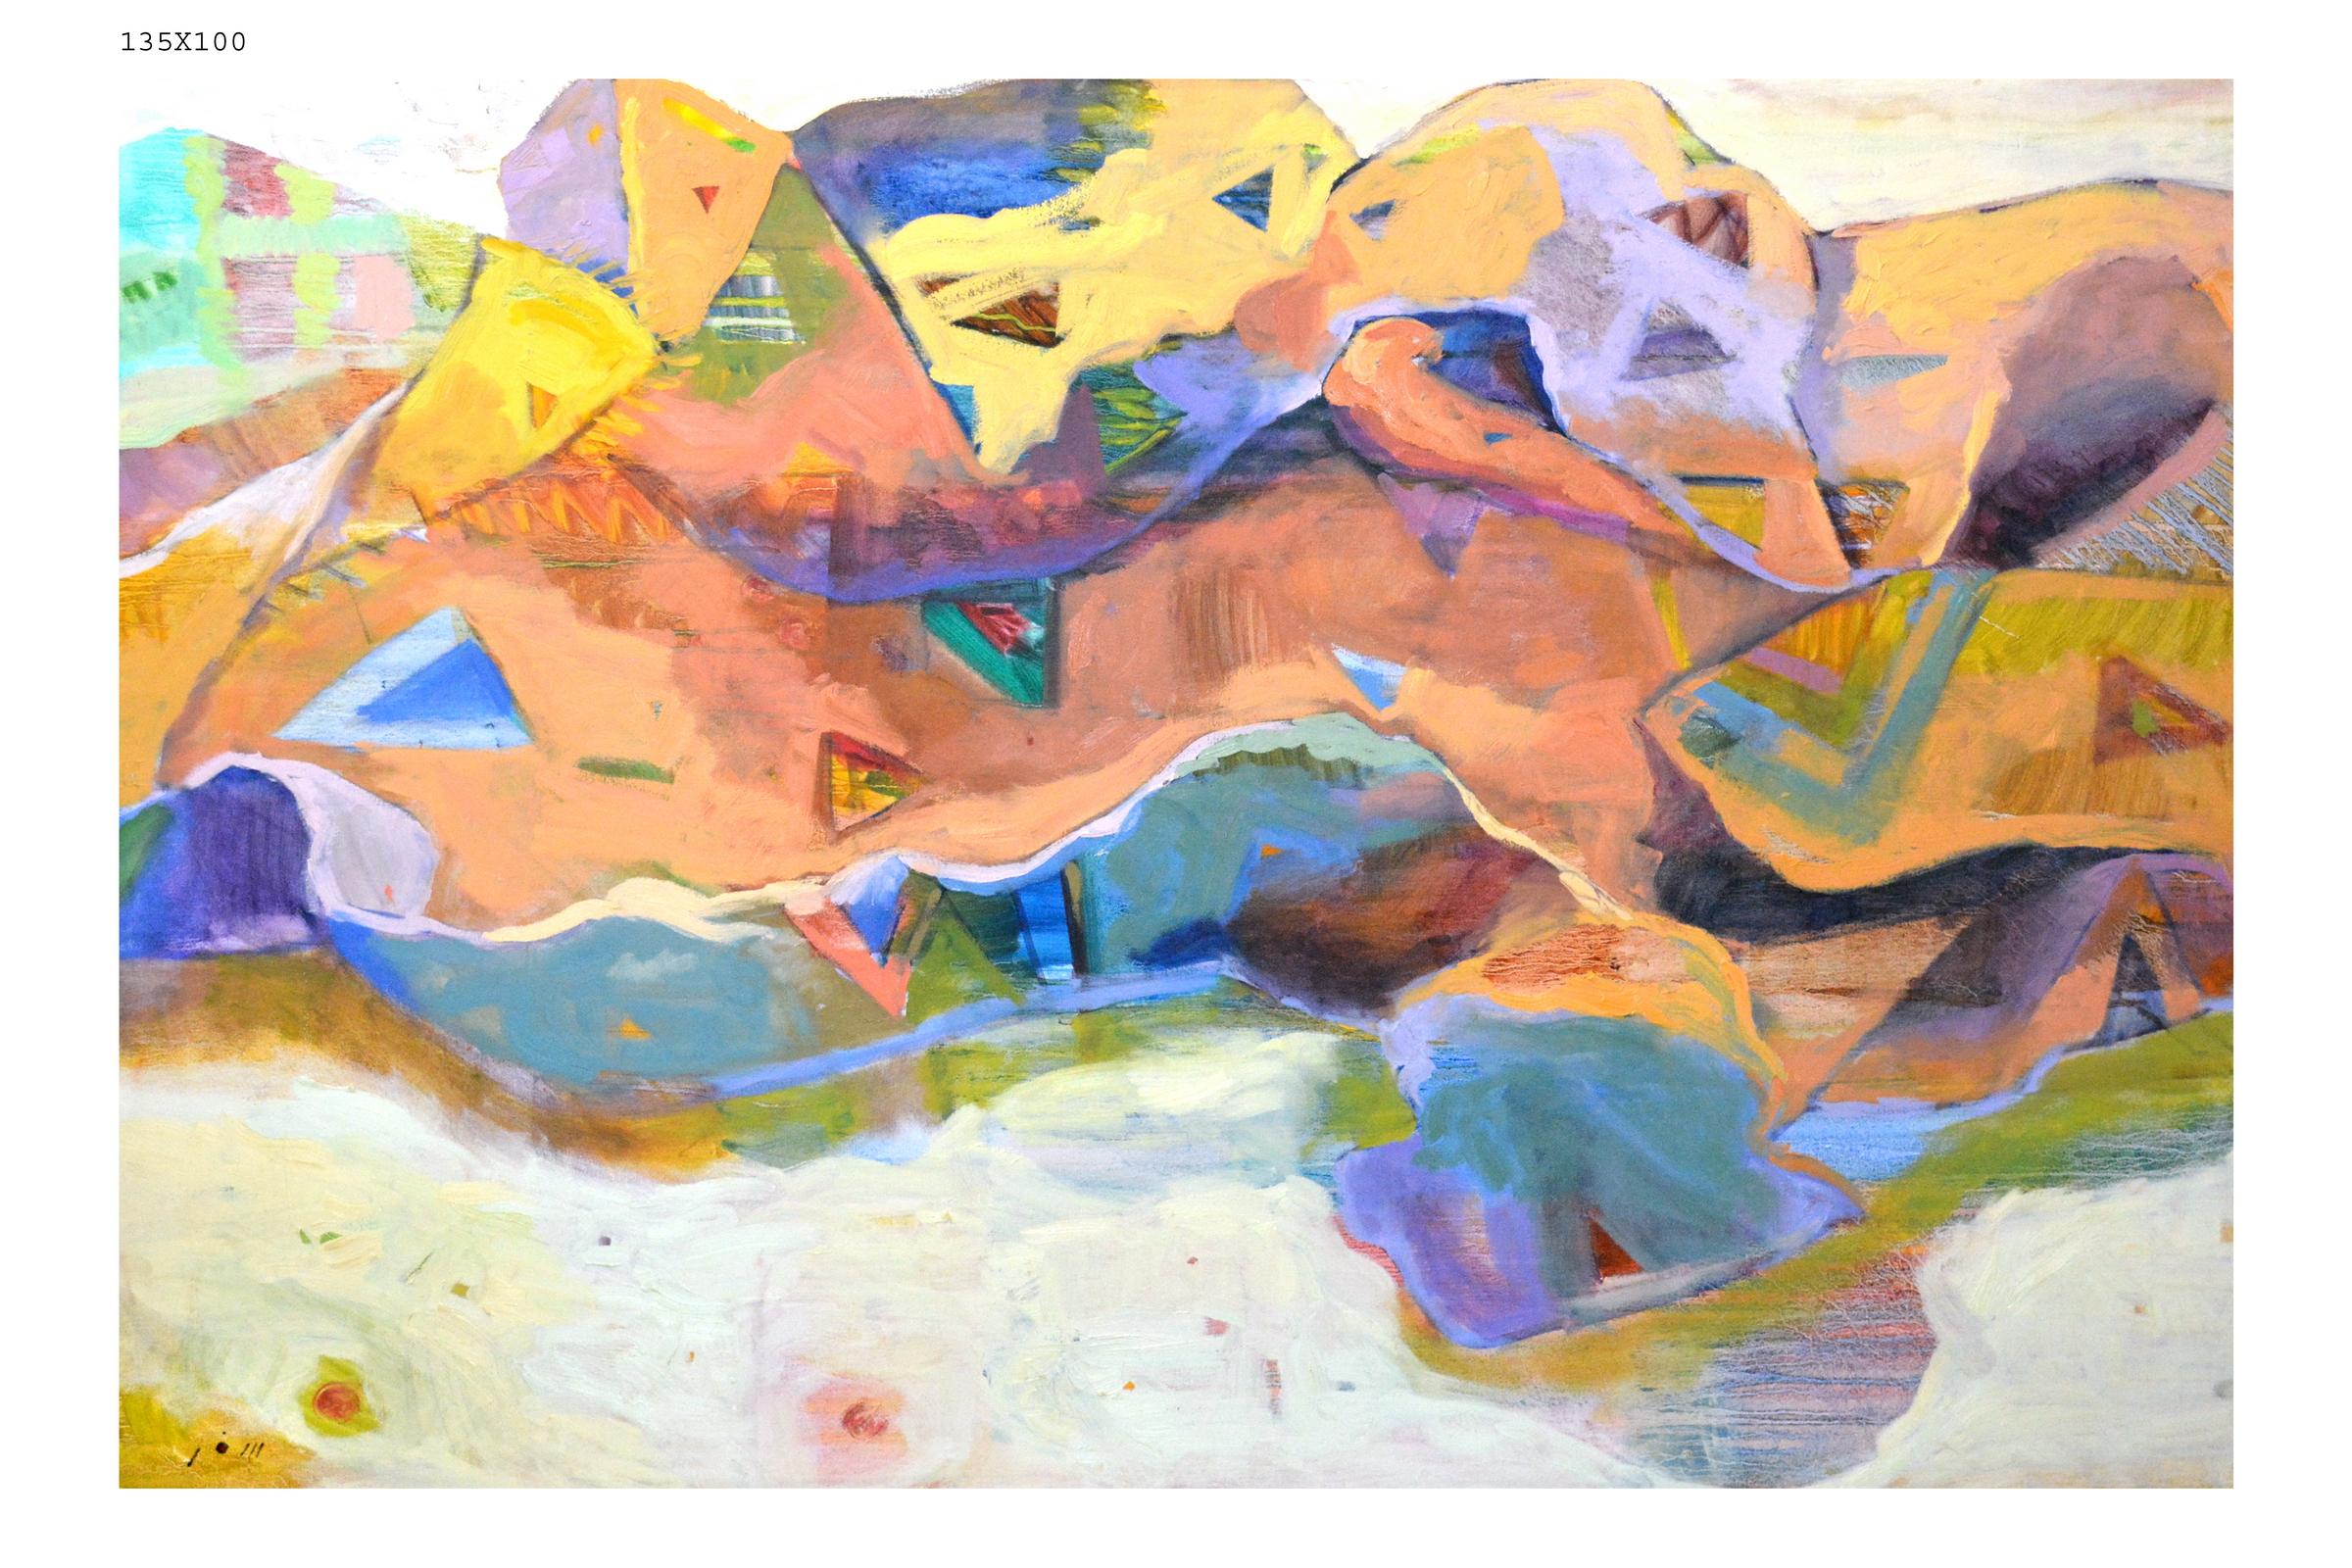 042_76 - artist Bana Safar  135 in 100 oil on canvas- الفنانة بانه سفر.JPG